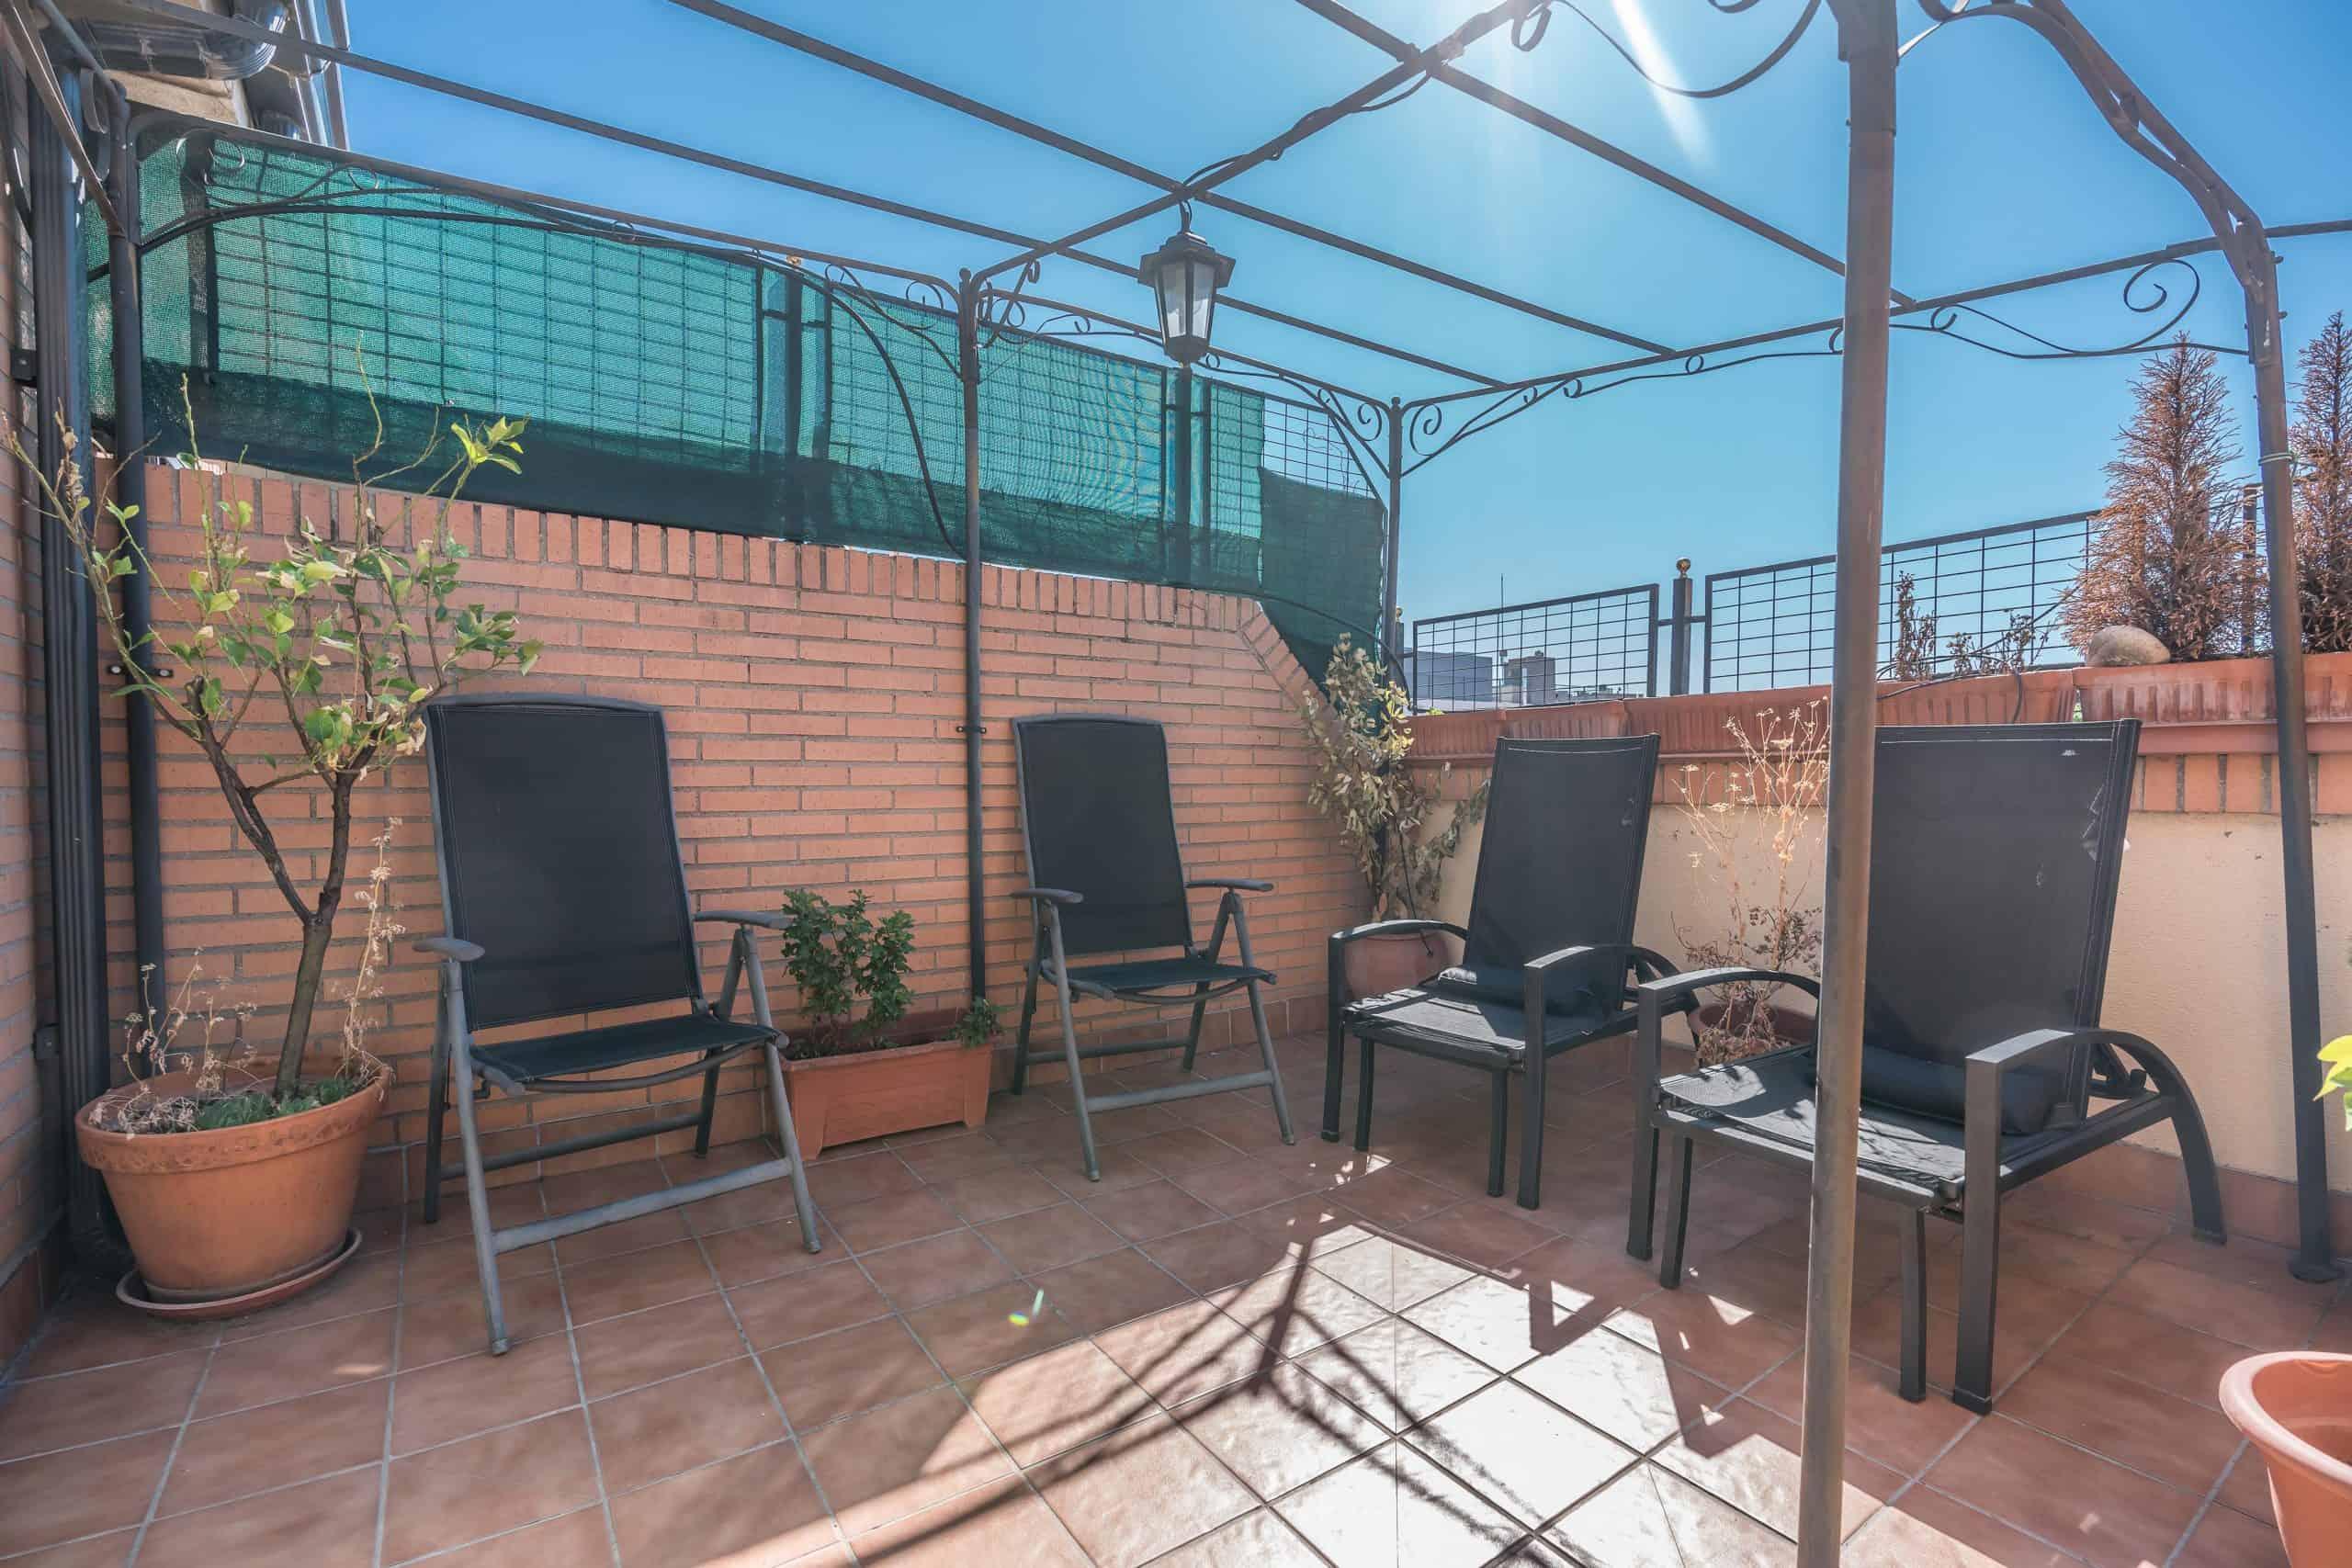 Agencia Inmobiliaria de Madrid-FUTUROCASA-Zona ARGANZUELA-EMBAJADORES-LEGAZPI2 TERRAZA (4)